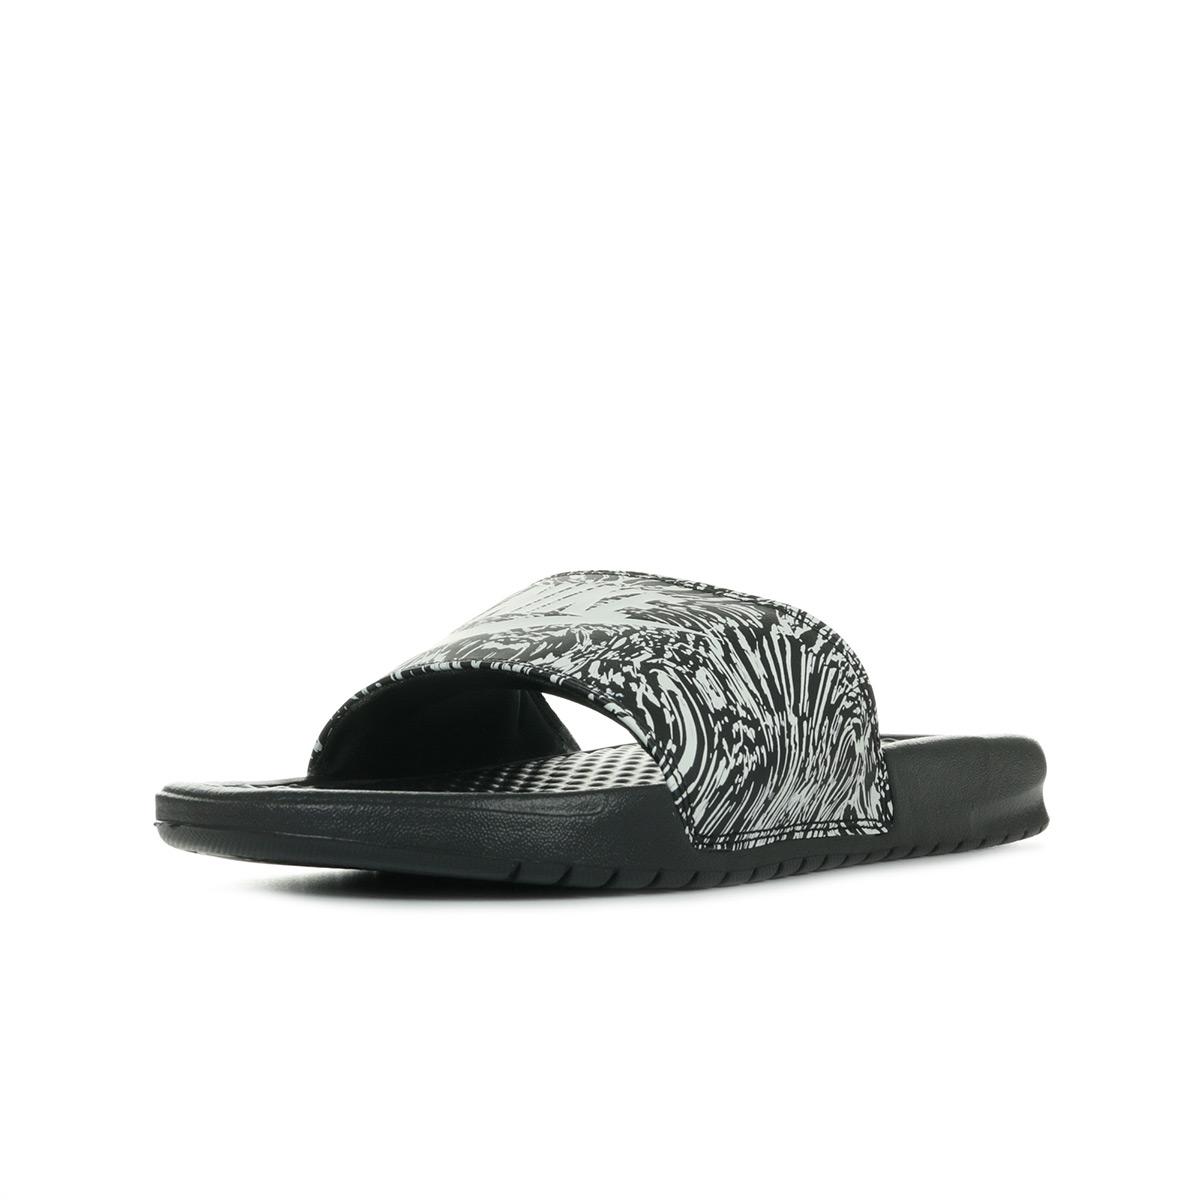 d3af0d03143 Nike Benassi JDI Print